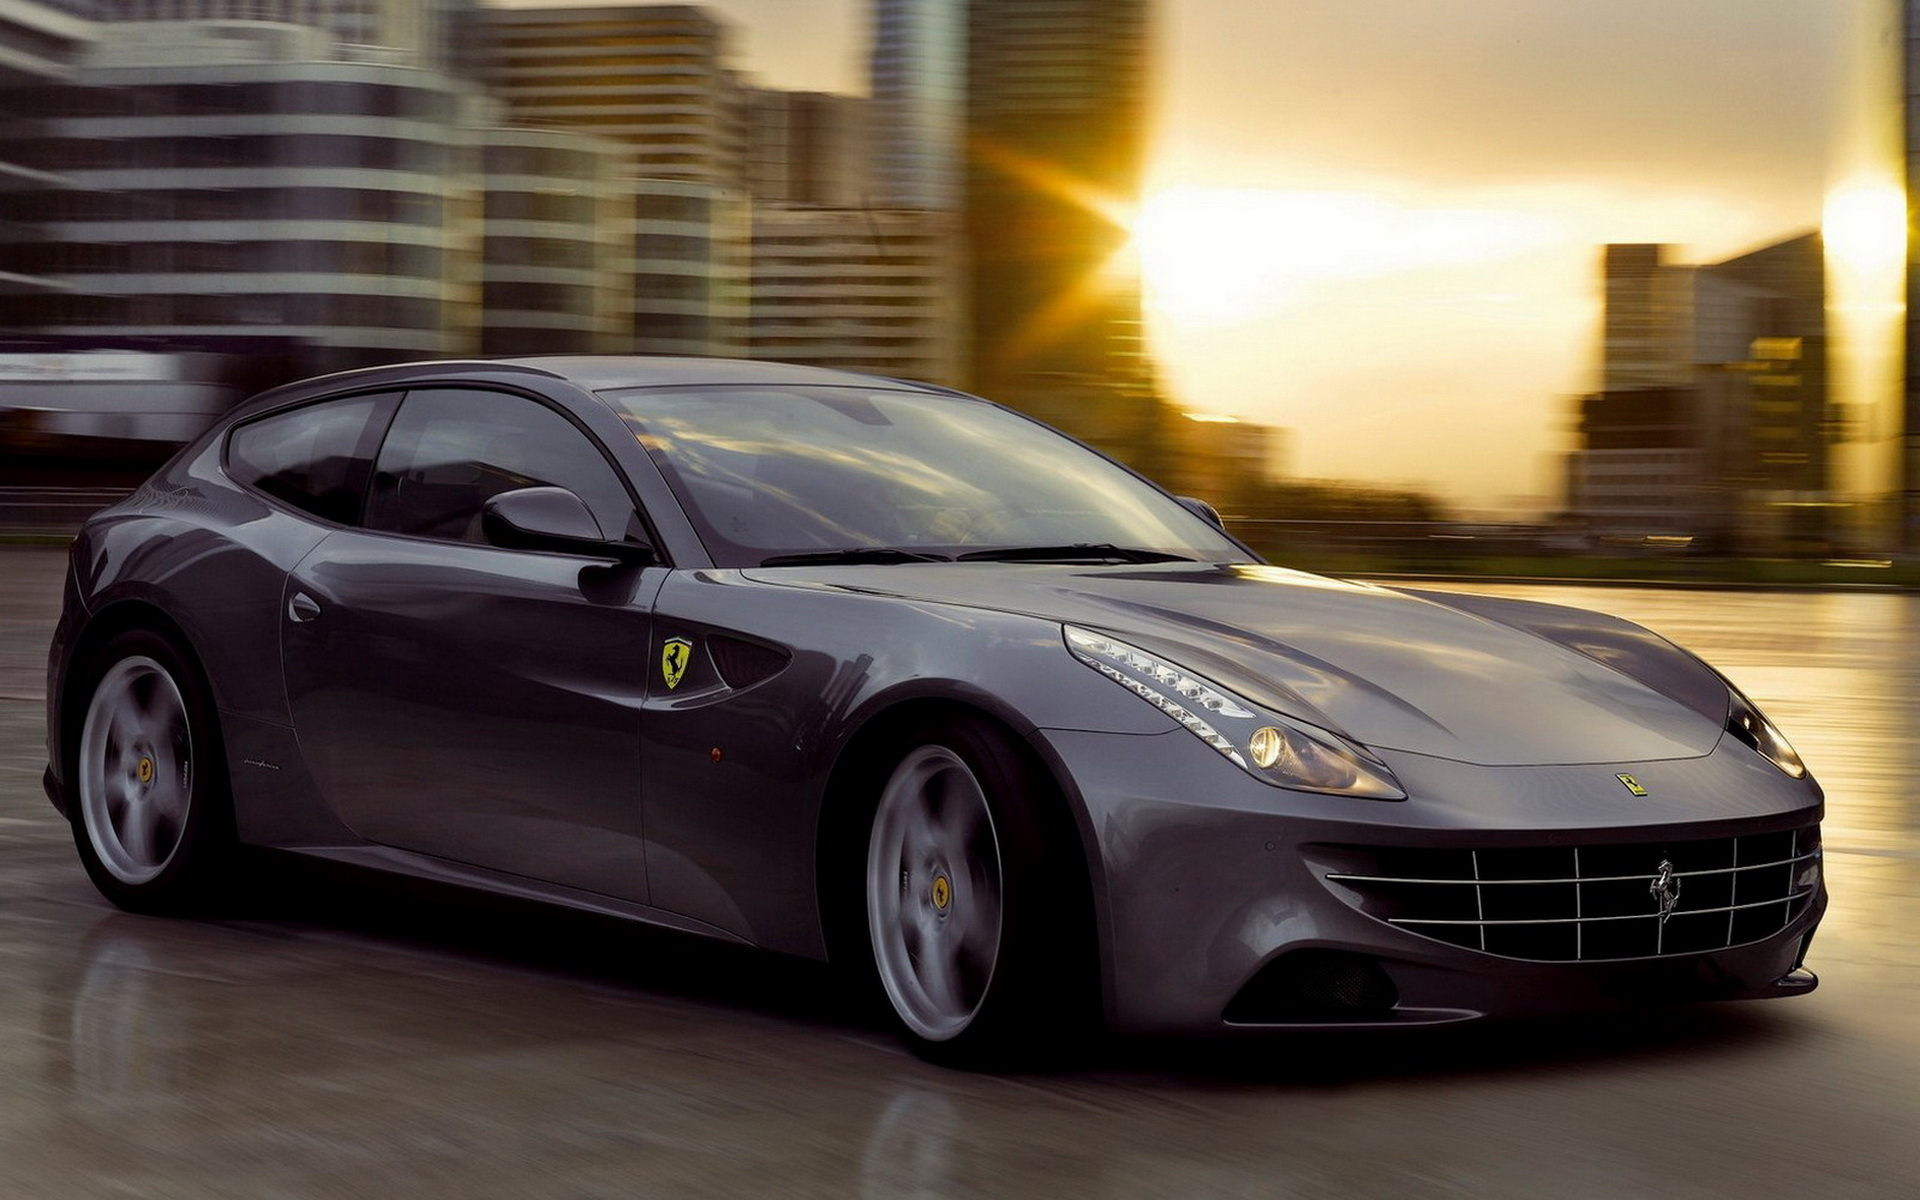 Auto_Ferrari_Others_Ferrari_new_Ferrari-FF_030983_.jpg